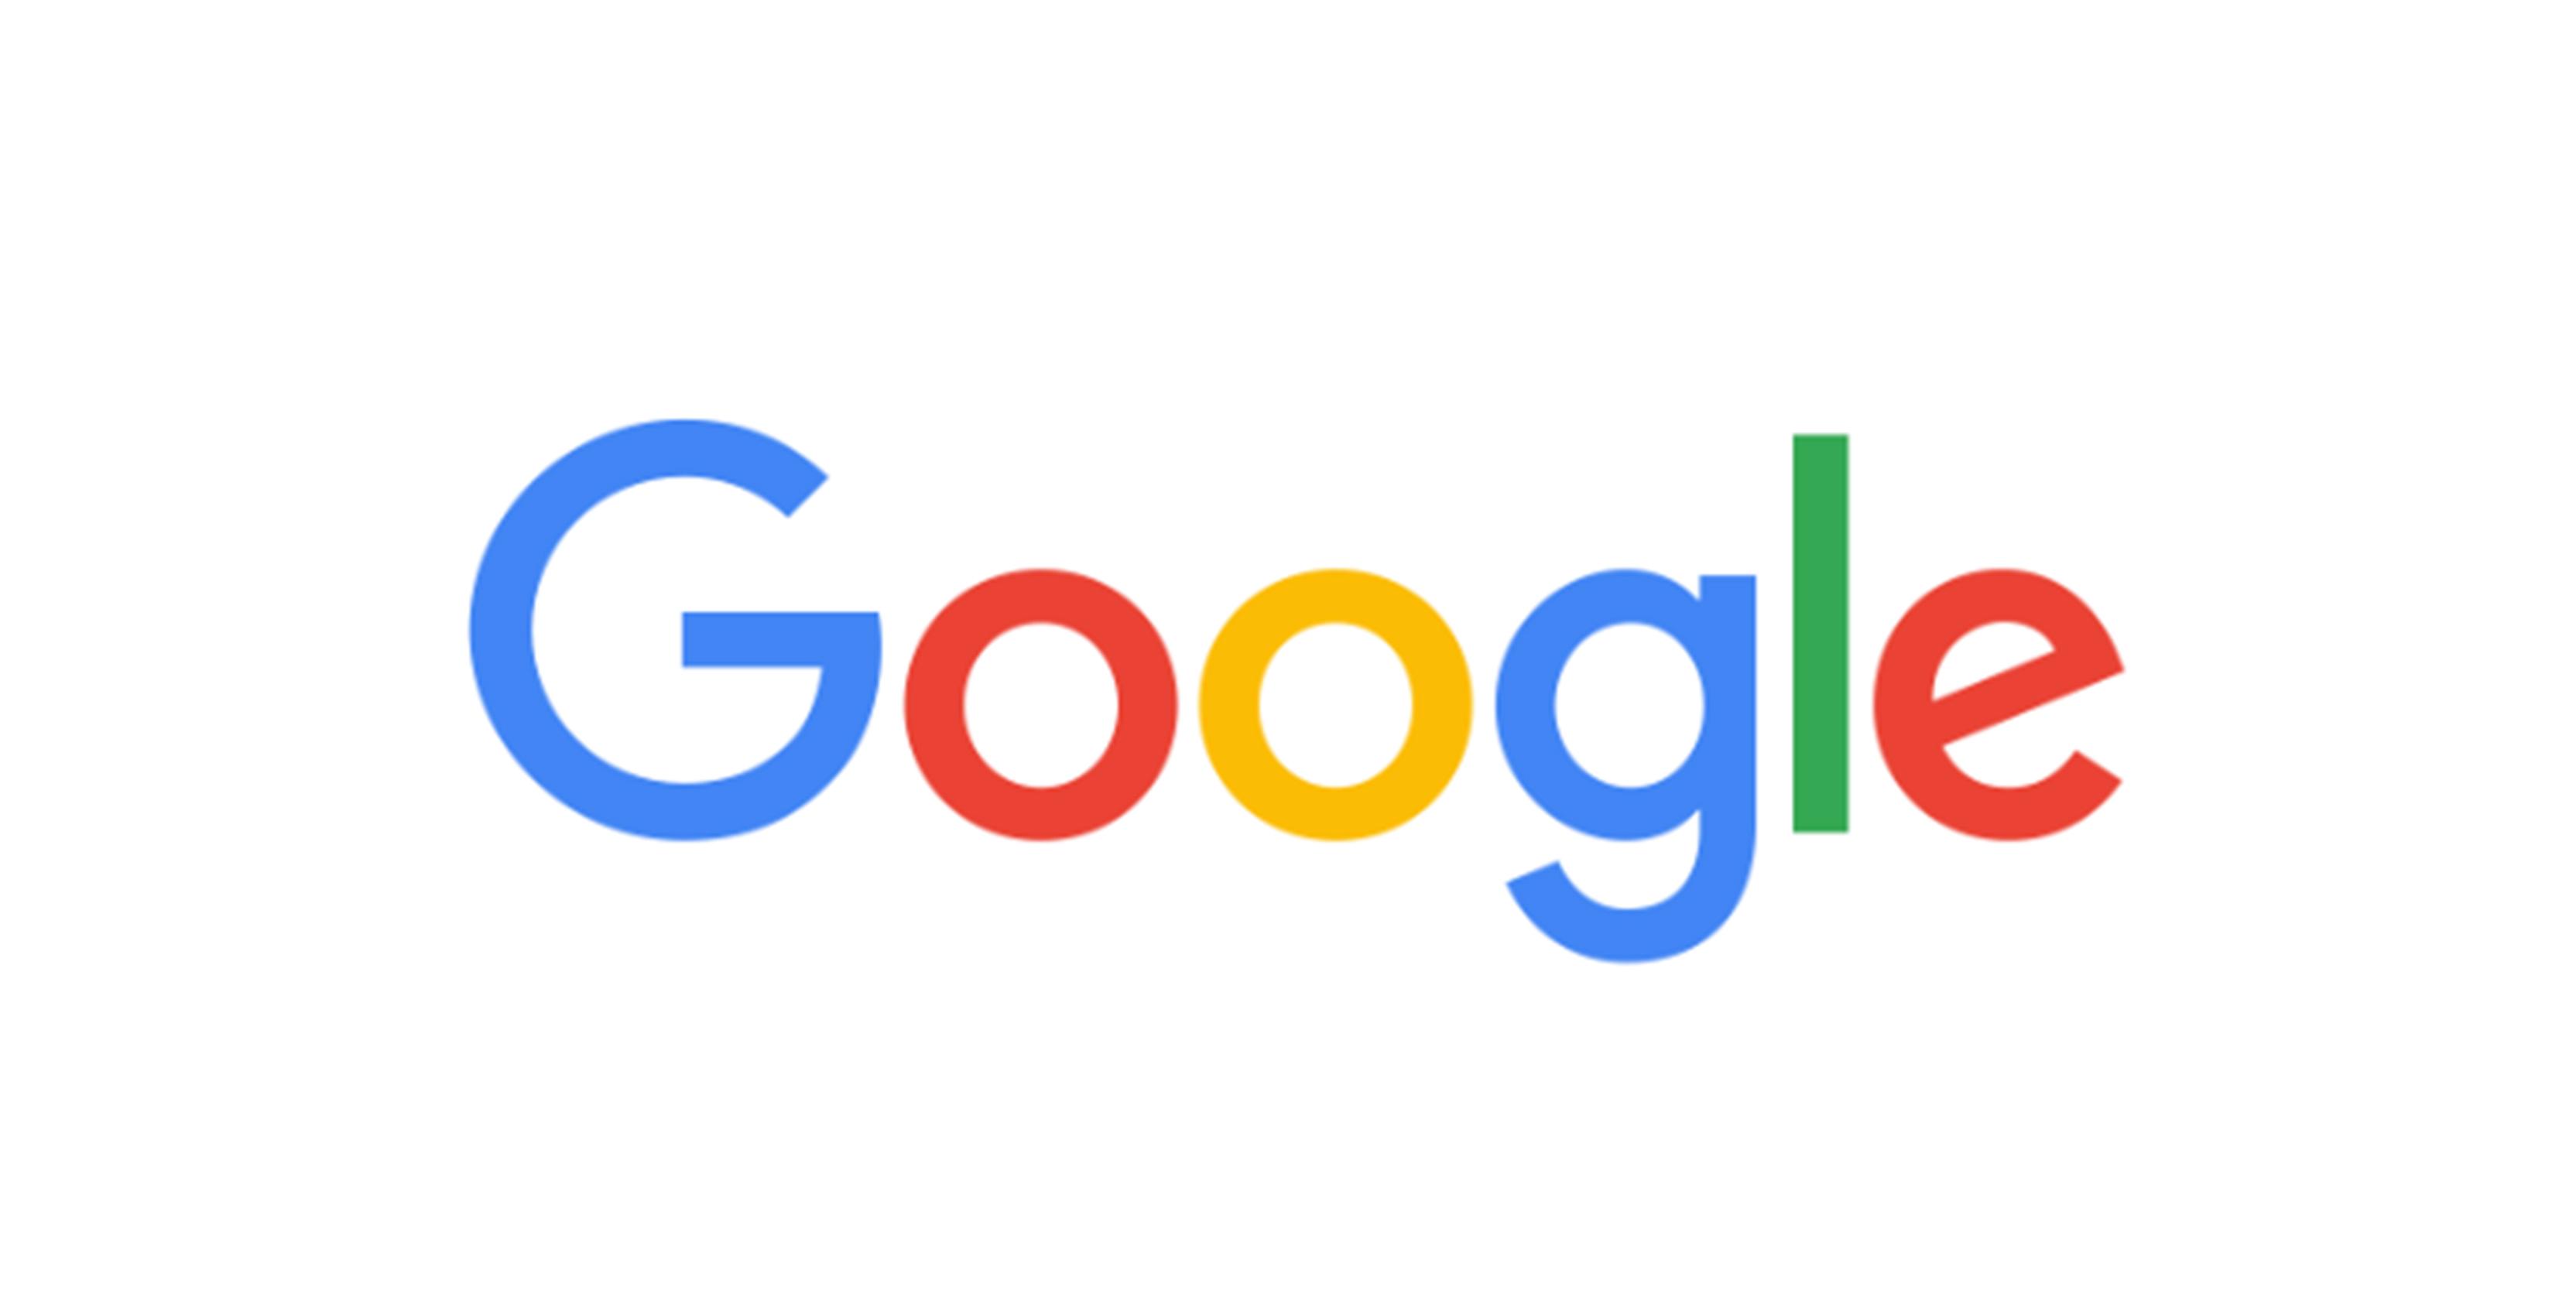 Google logo in Google Sans